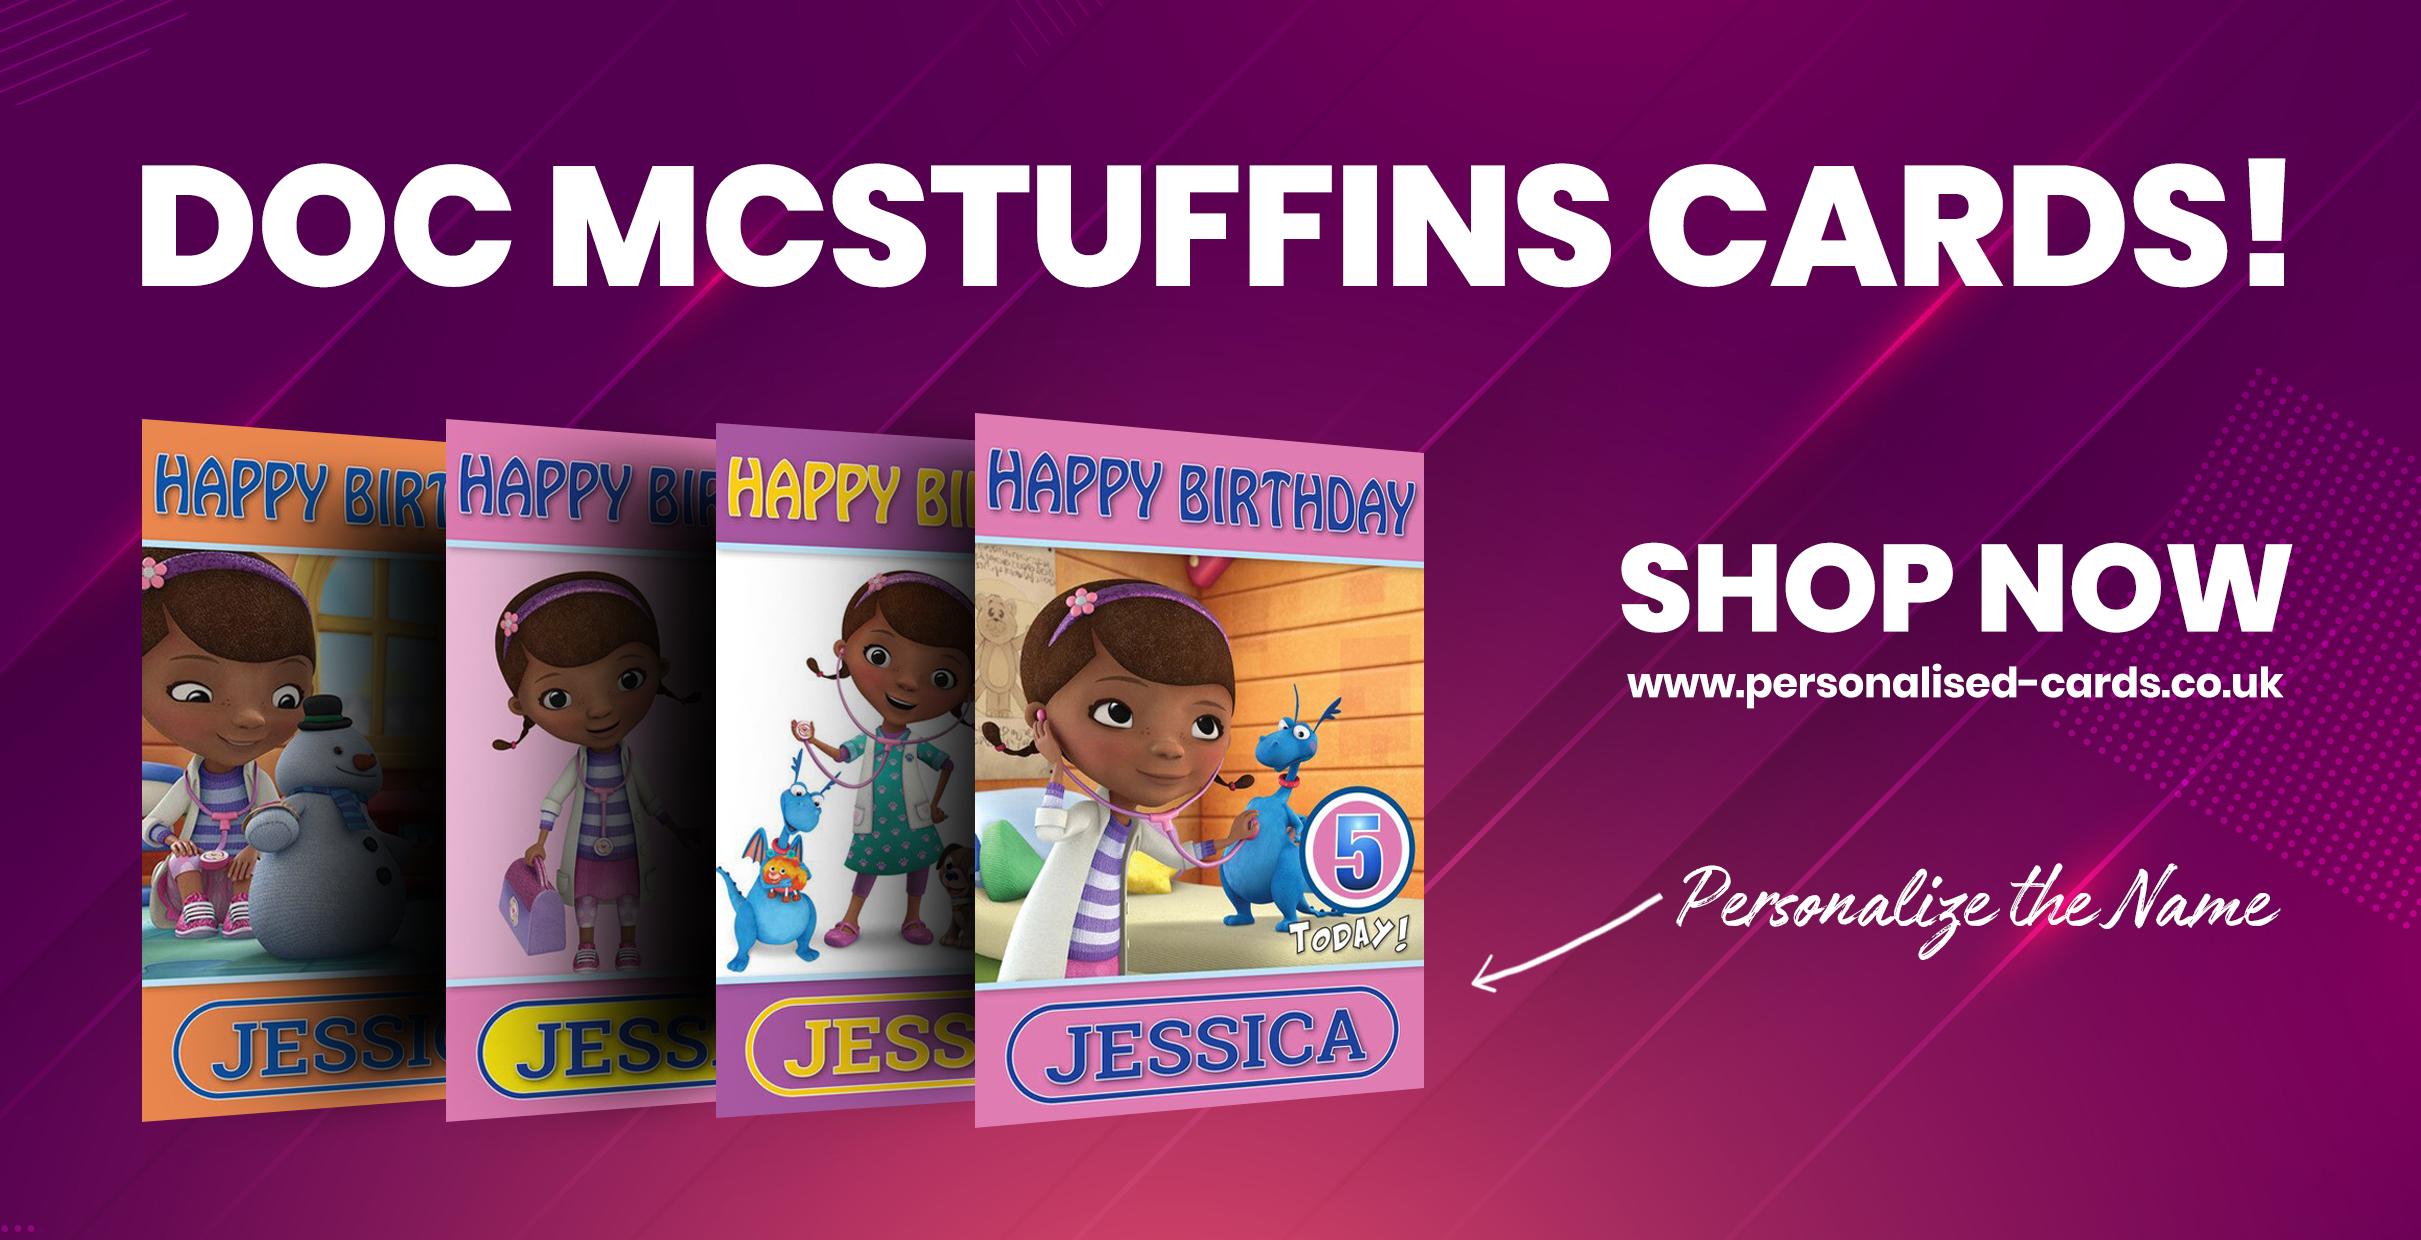 doc-mcstuffins-cards.jpg